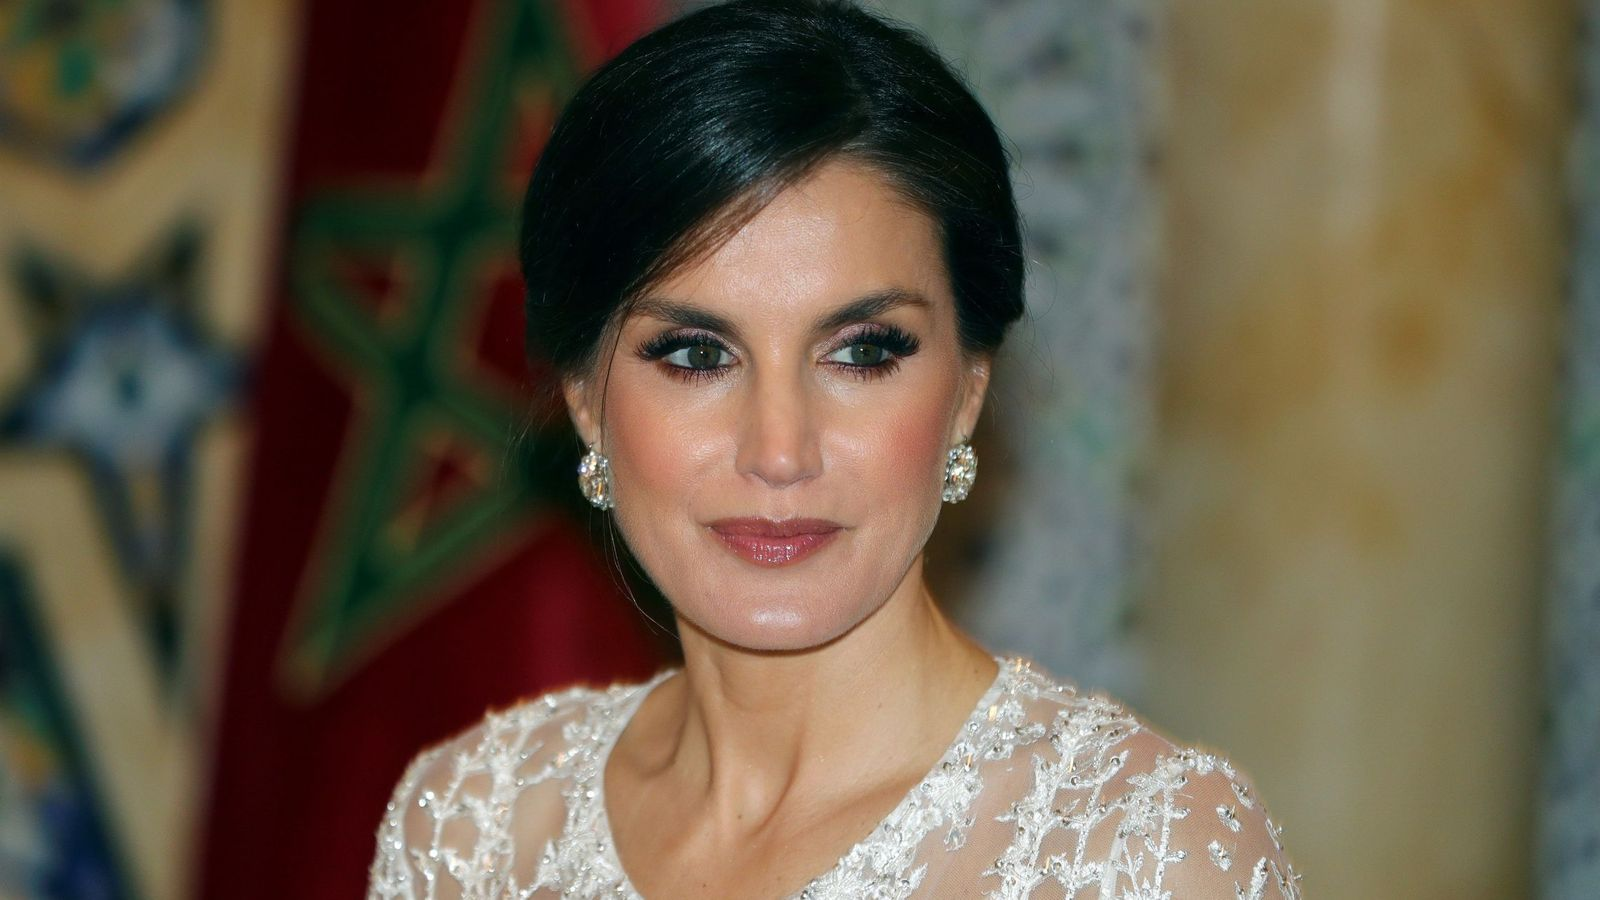 Foto: La reina Letizia en Marruecos. (EFE)